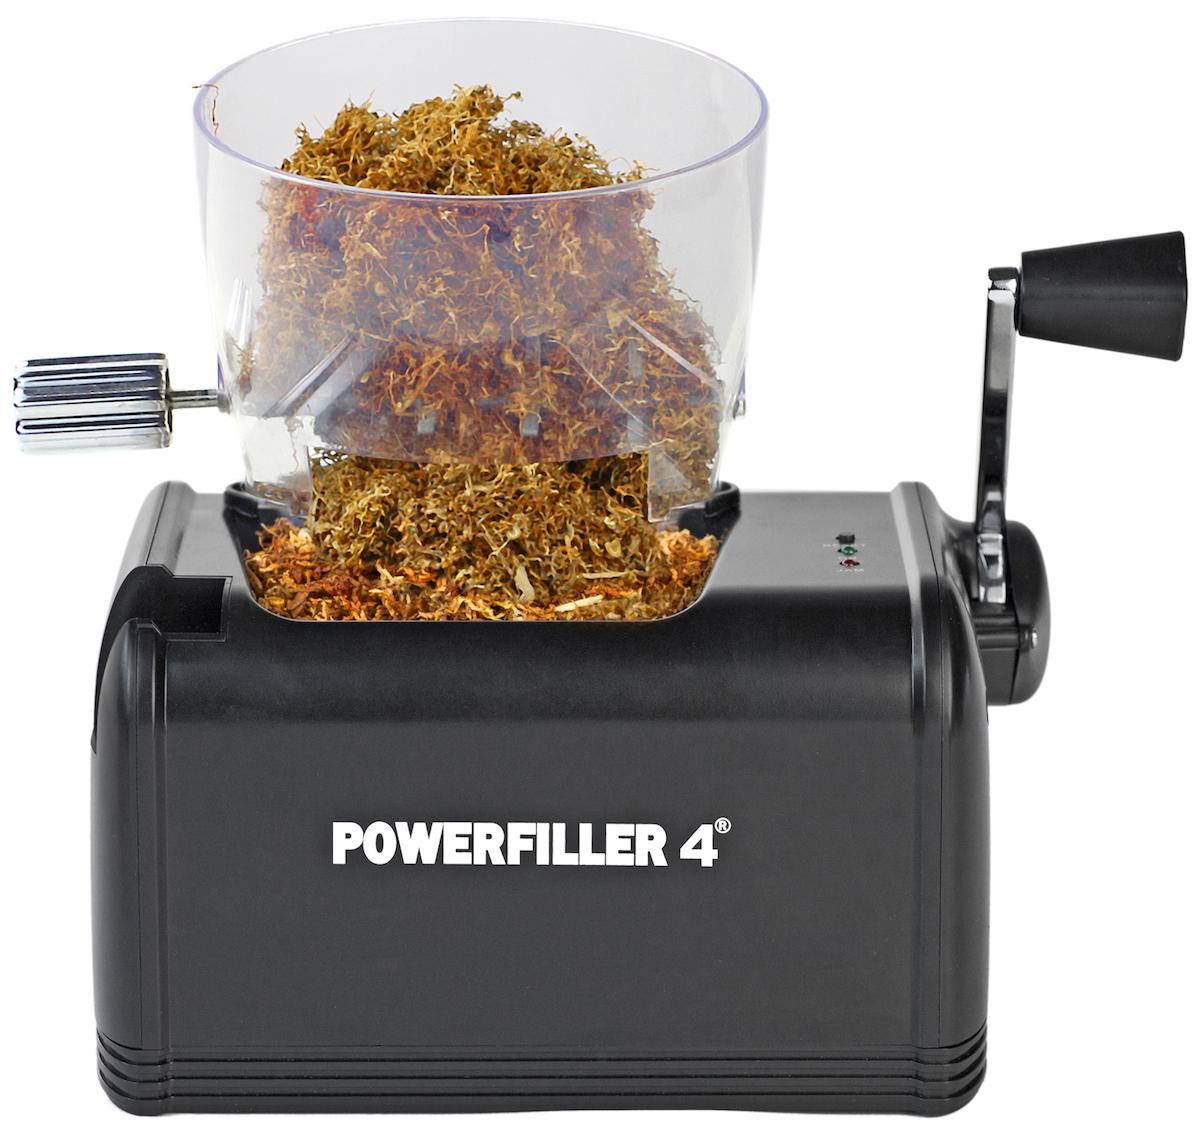 Powerfiller 4 Elektrische Zigarettenstopfmaschine XXL